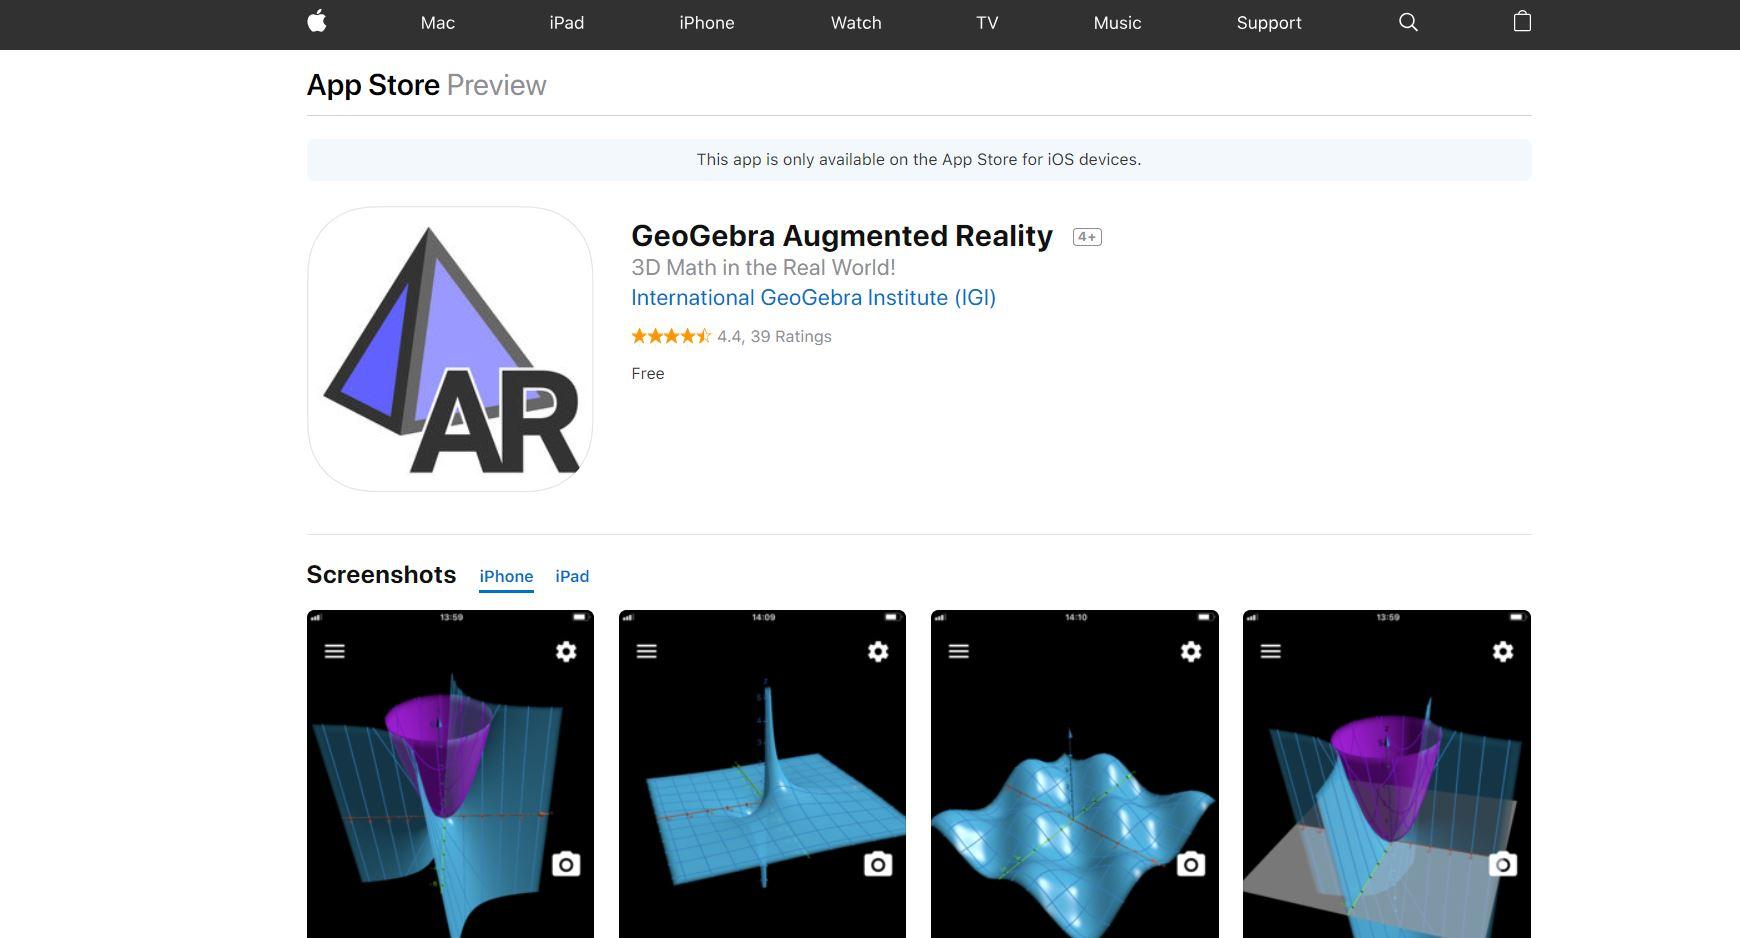 GeoGebra Augmented Reality CodaKid Top 21 Math Apps of 2019